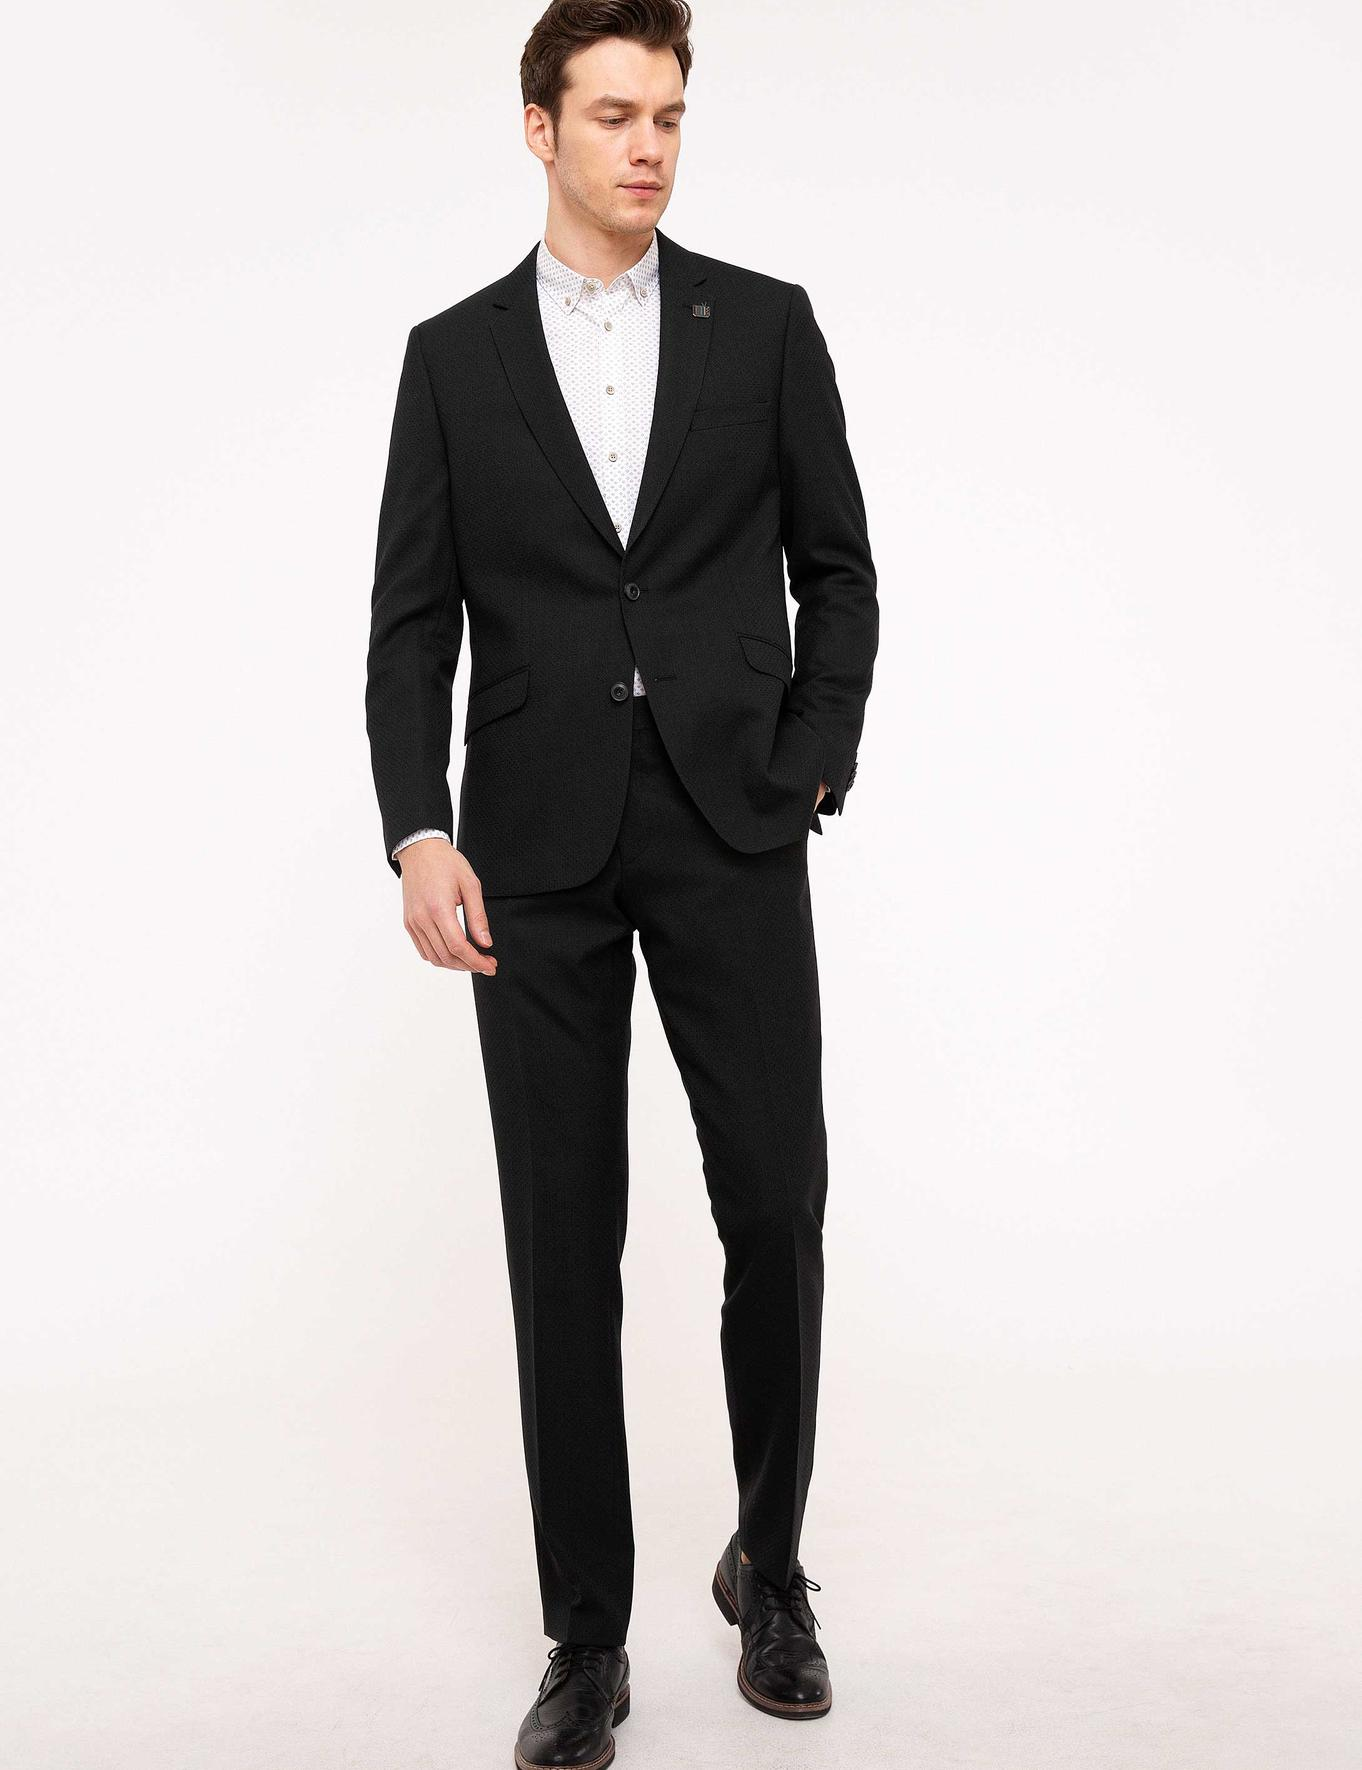 Yeşil Slim Fit Takım Elbise - 50200671020